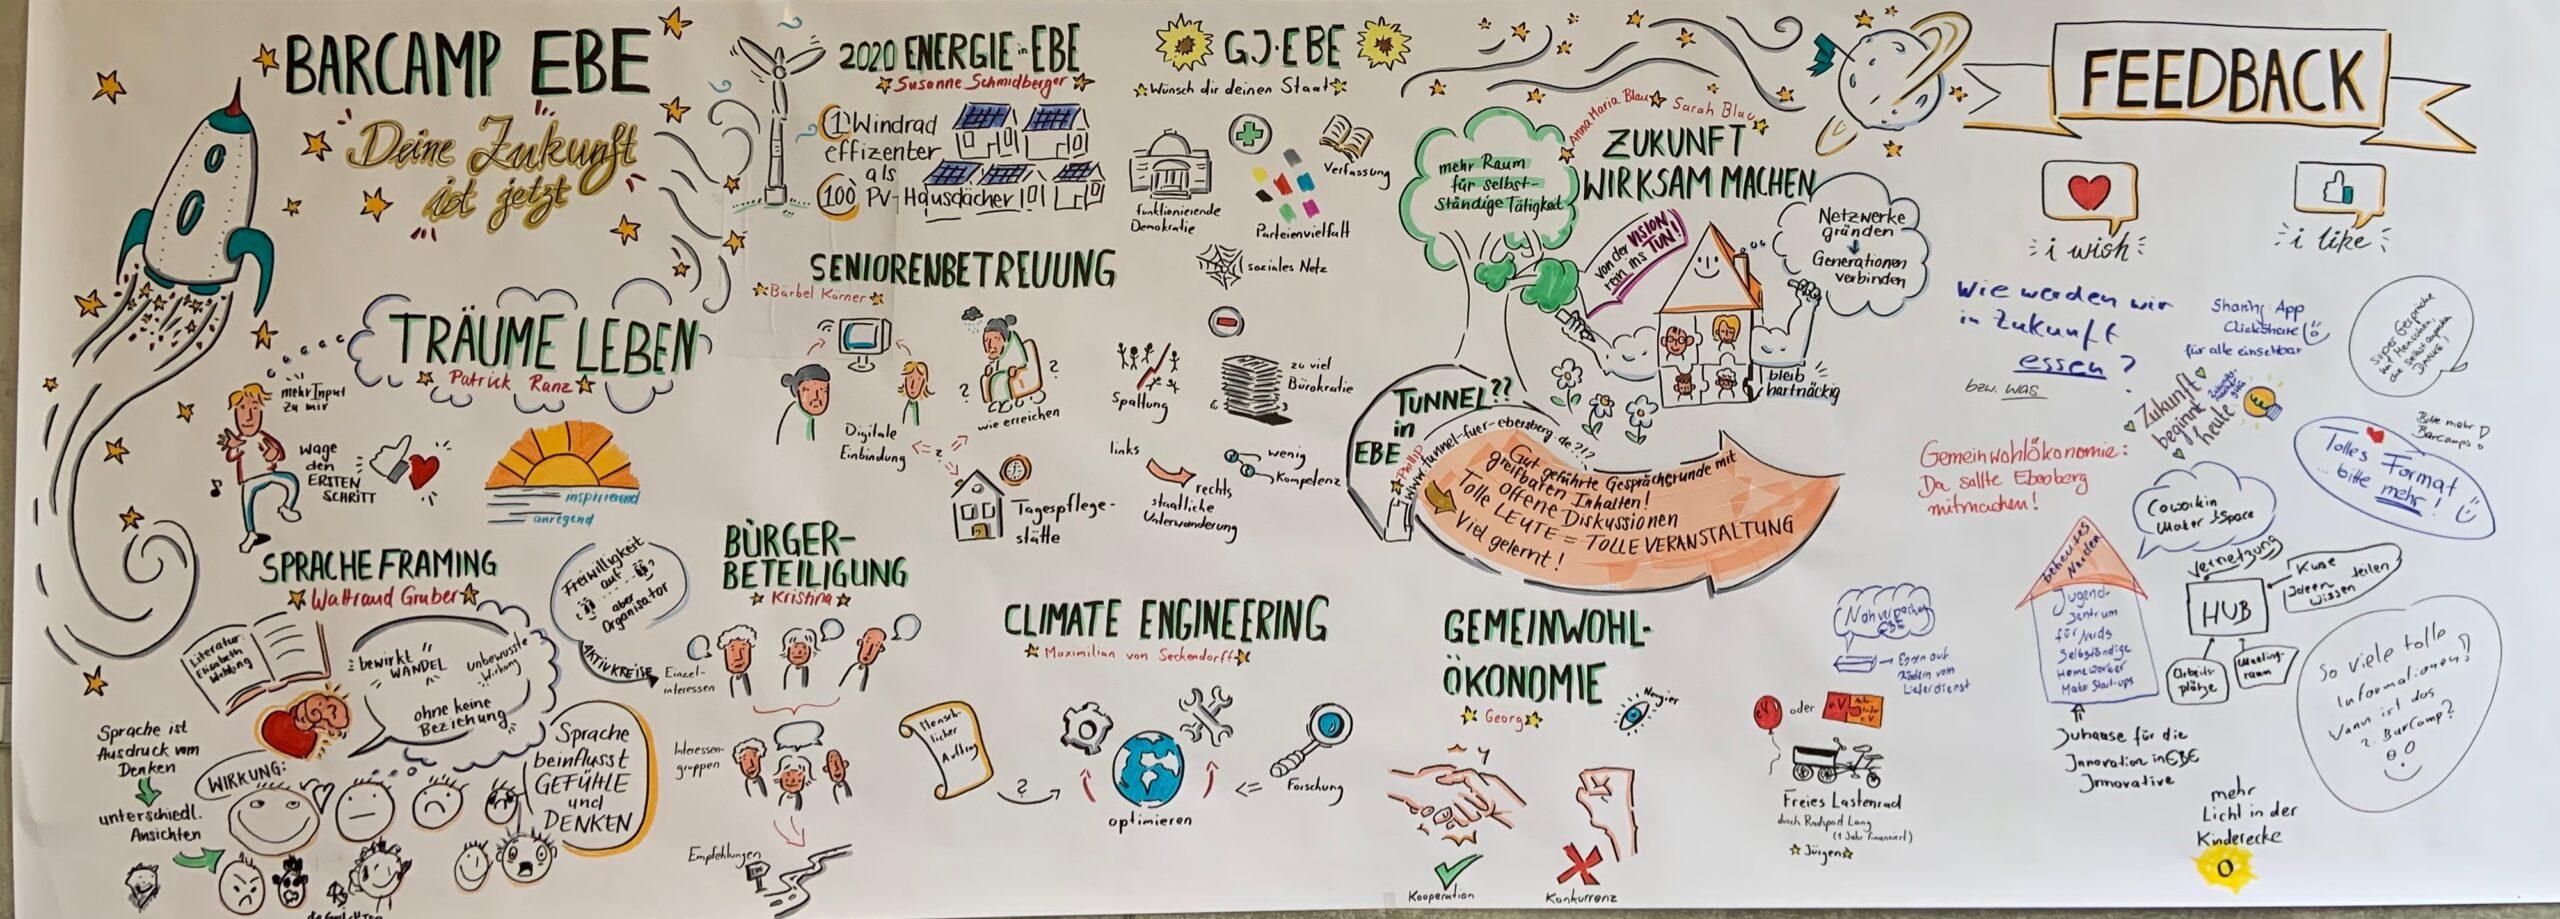 Barcamp Ebersberg Graphic Wall Live-Dokumentation